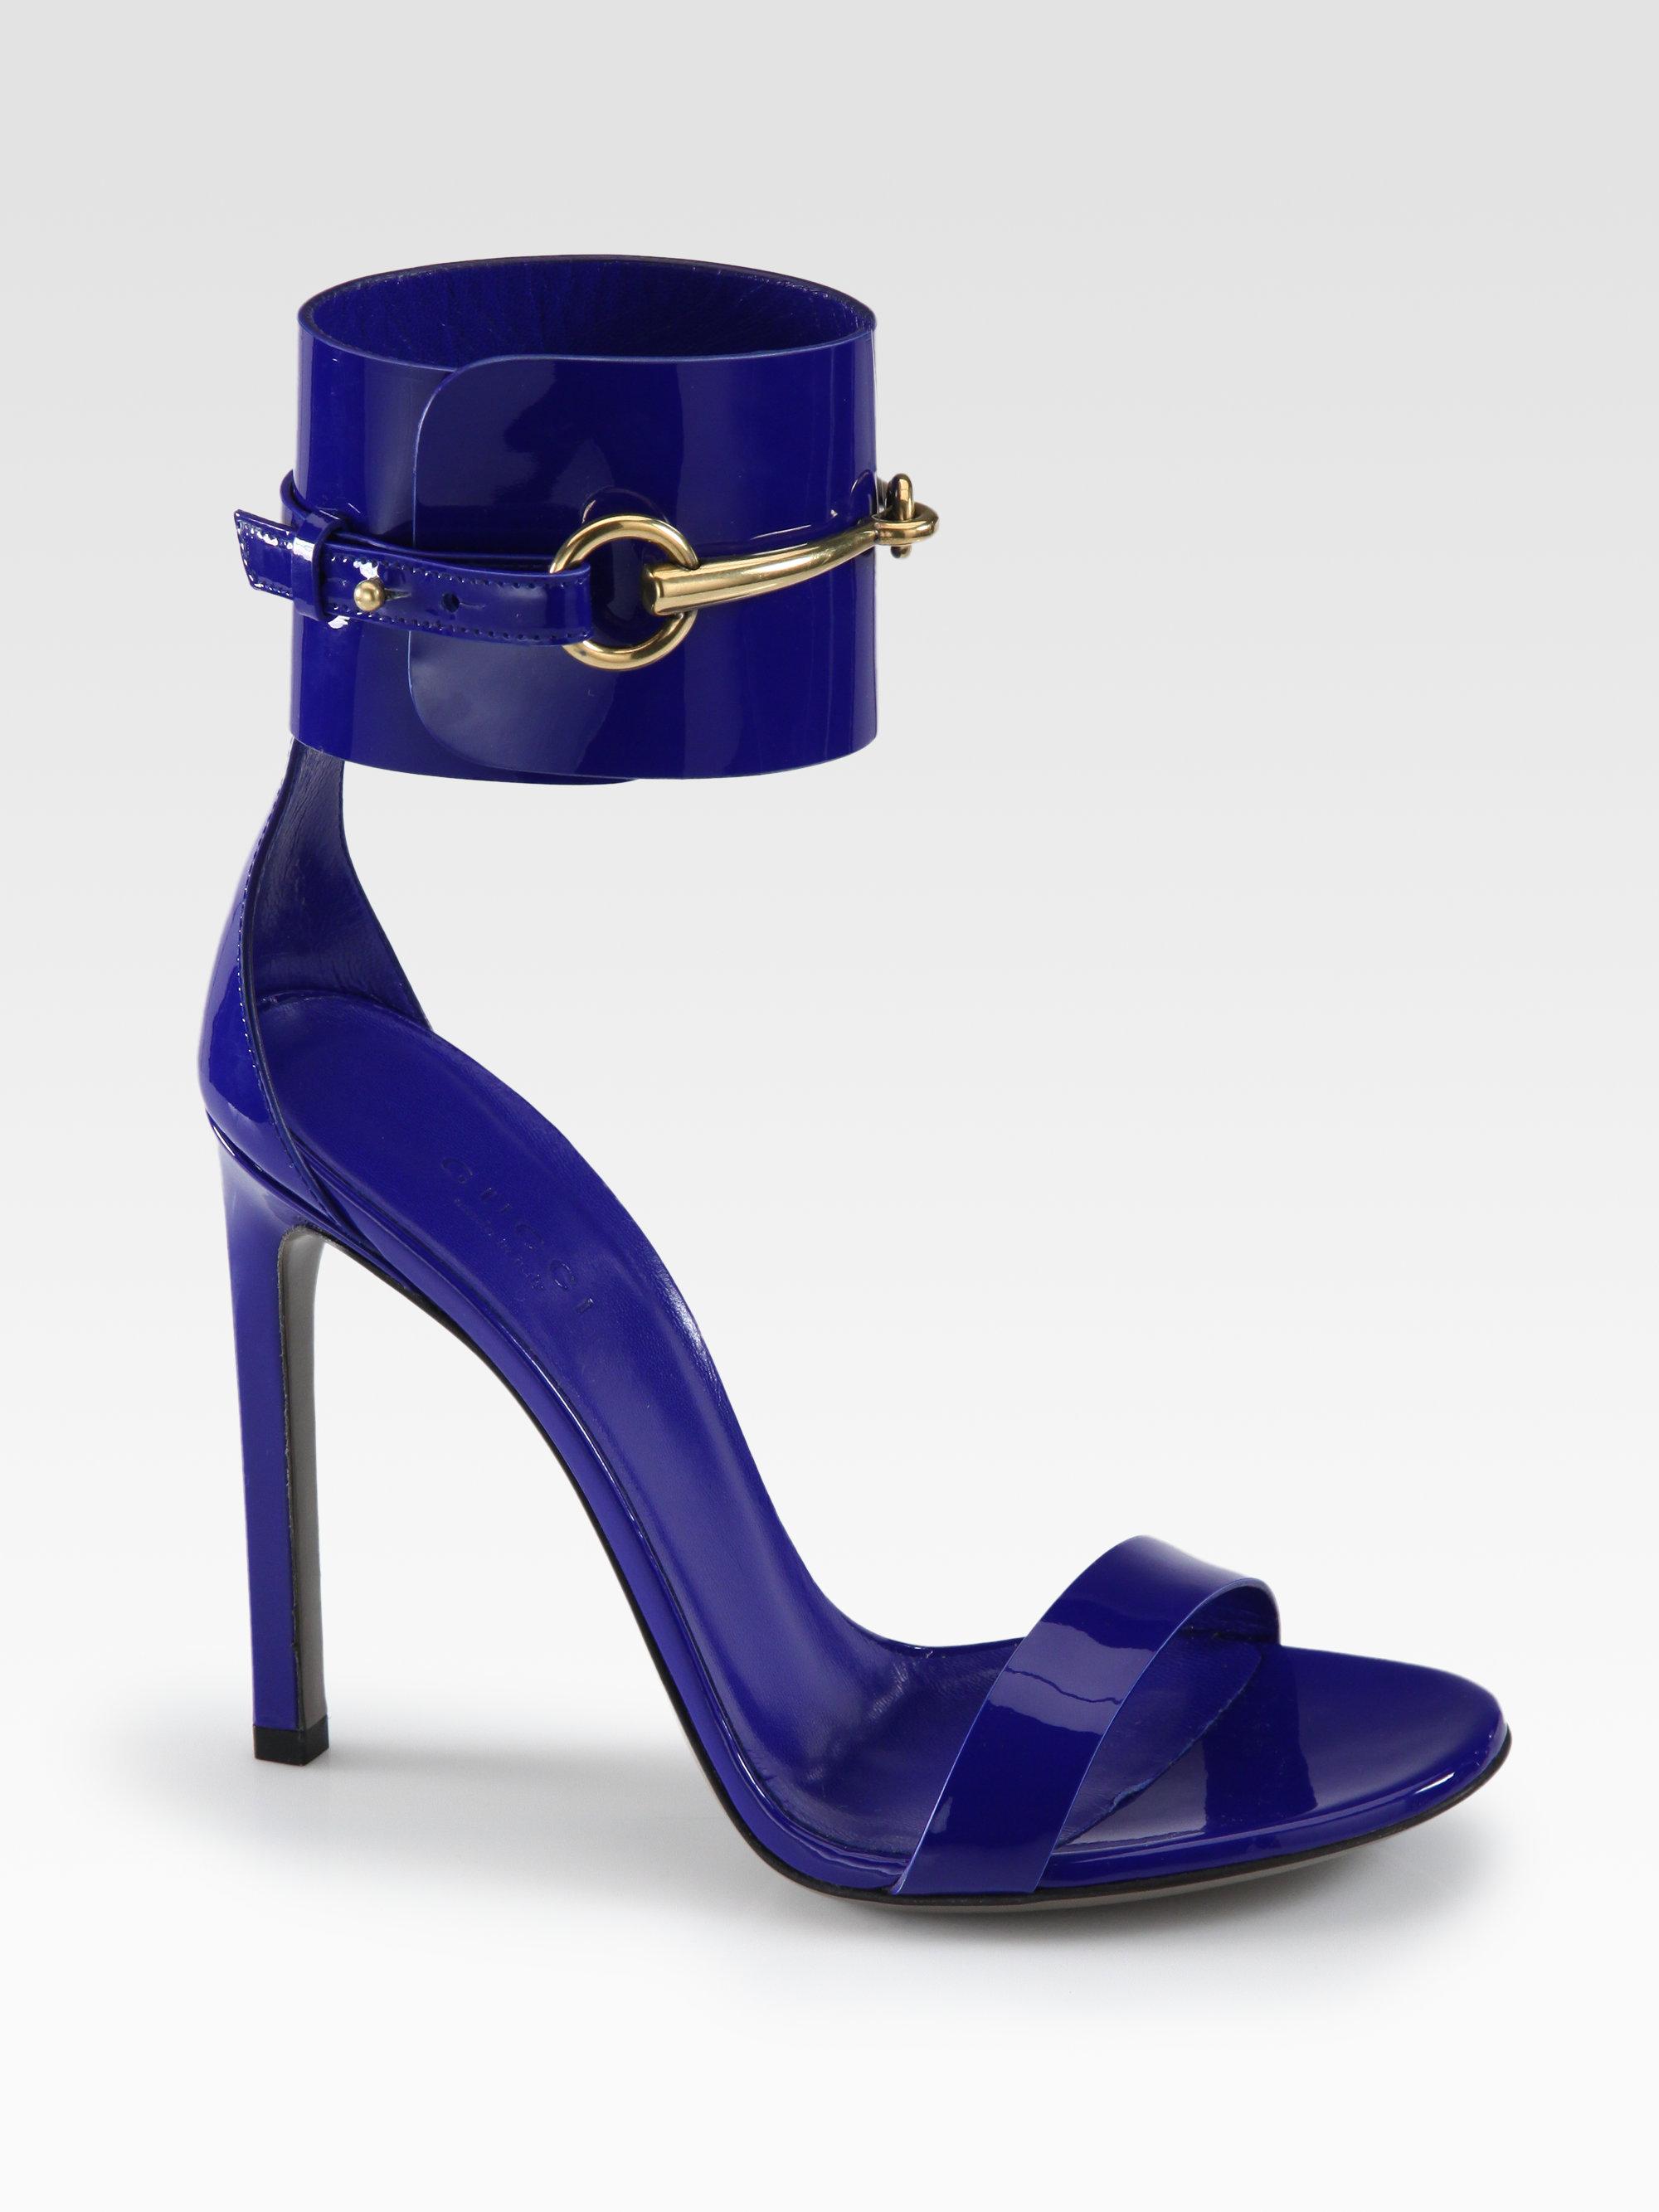 9453f559d63 Lyst - Gucci Ursula Patent Leather Horsebit Ankle-Strap Sandals in Black